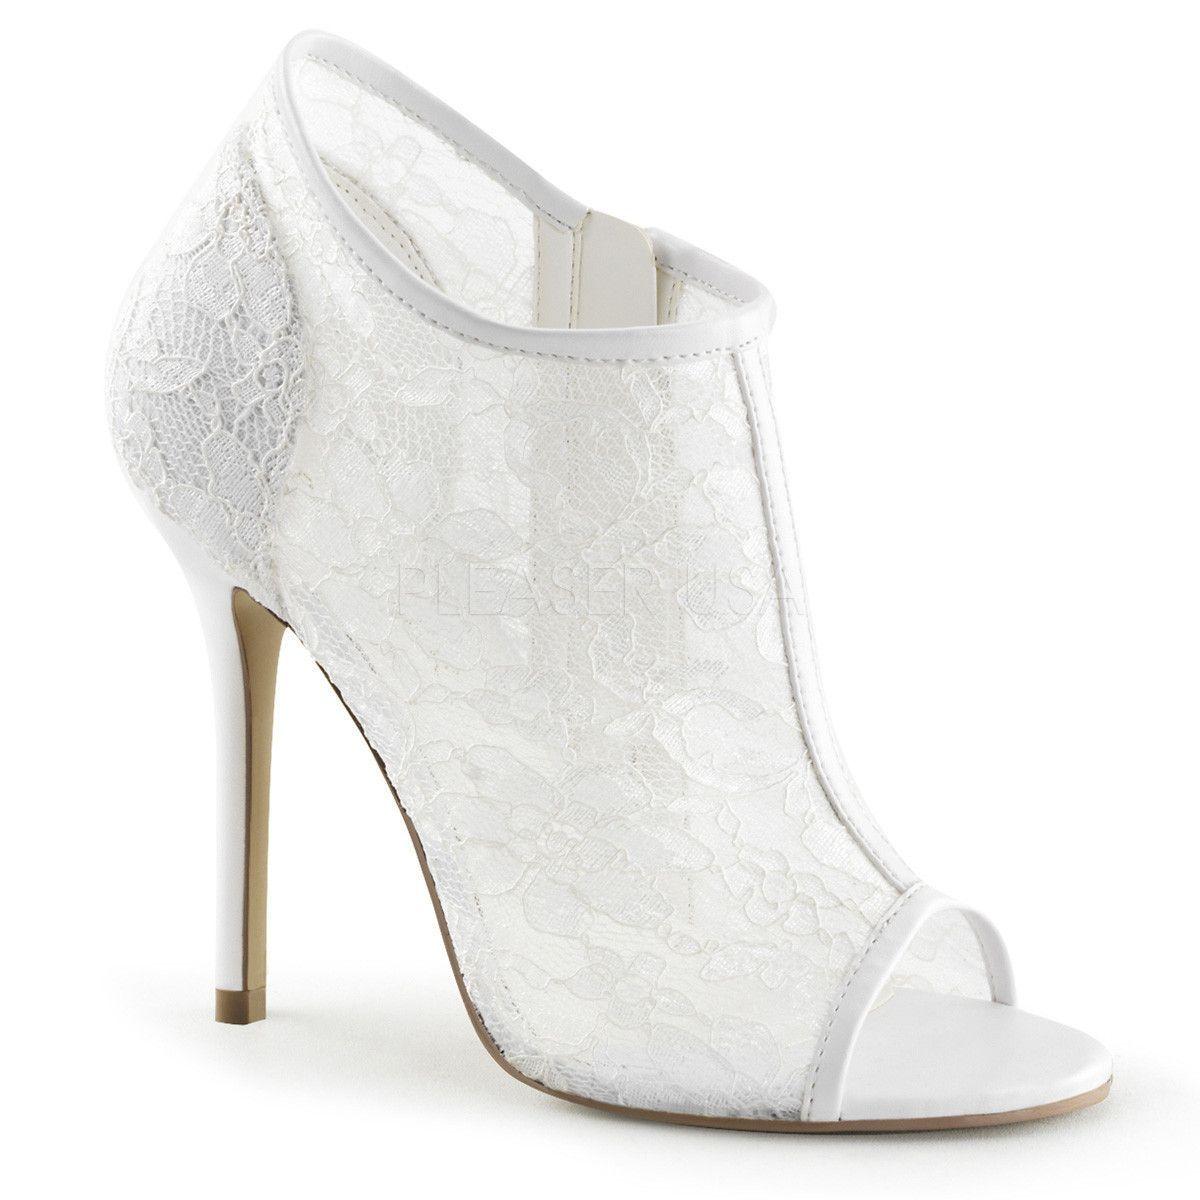 0582205e3c7 Ivory White Fabulicious Mesh Overlay Open-Toe Shoes